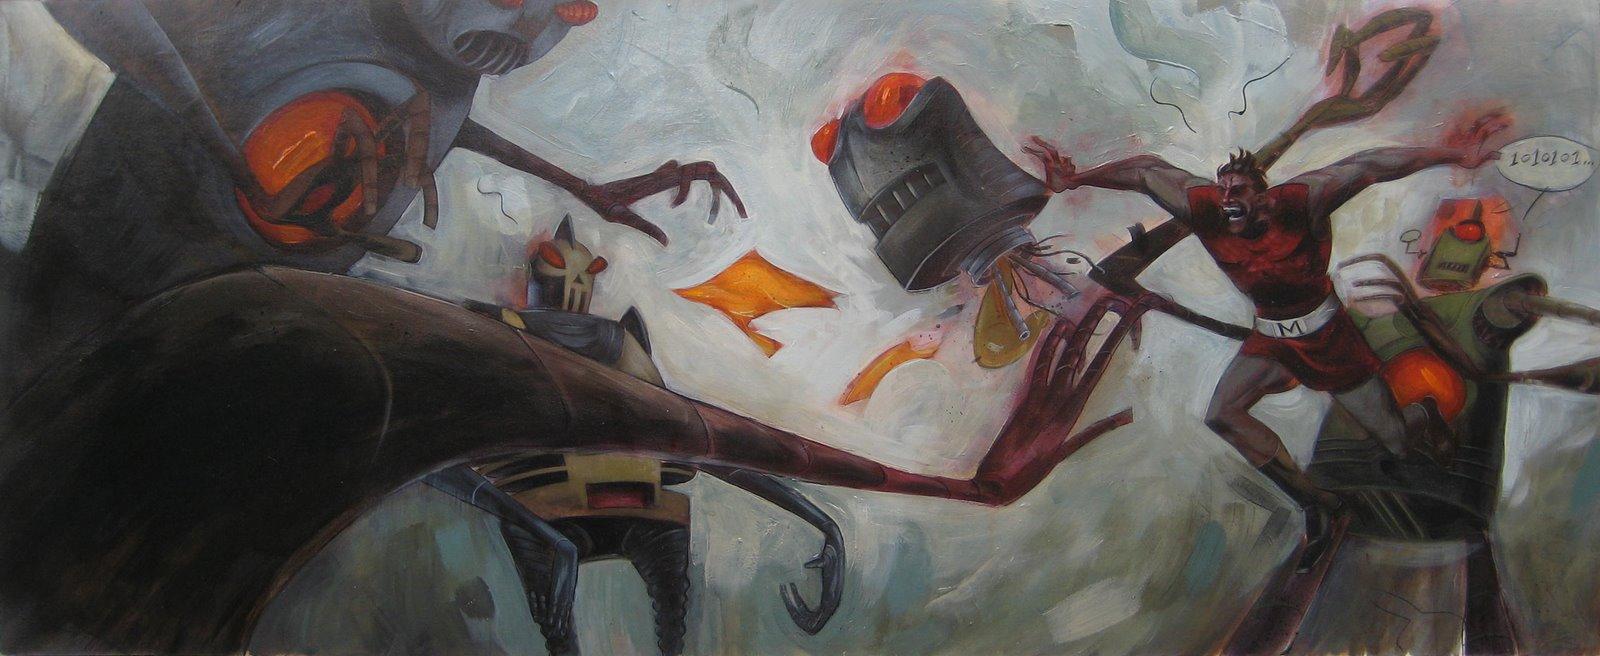 [The+Robot+Fighter.jpg]